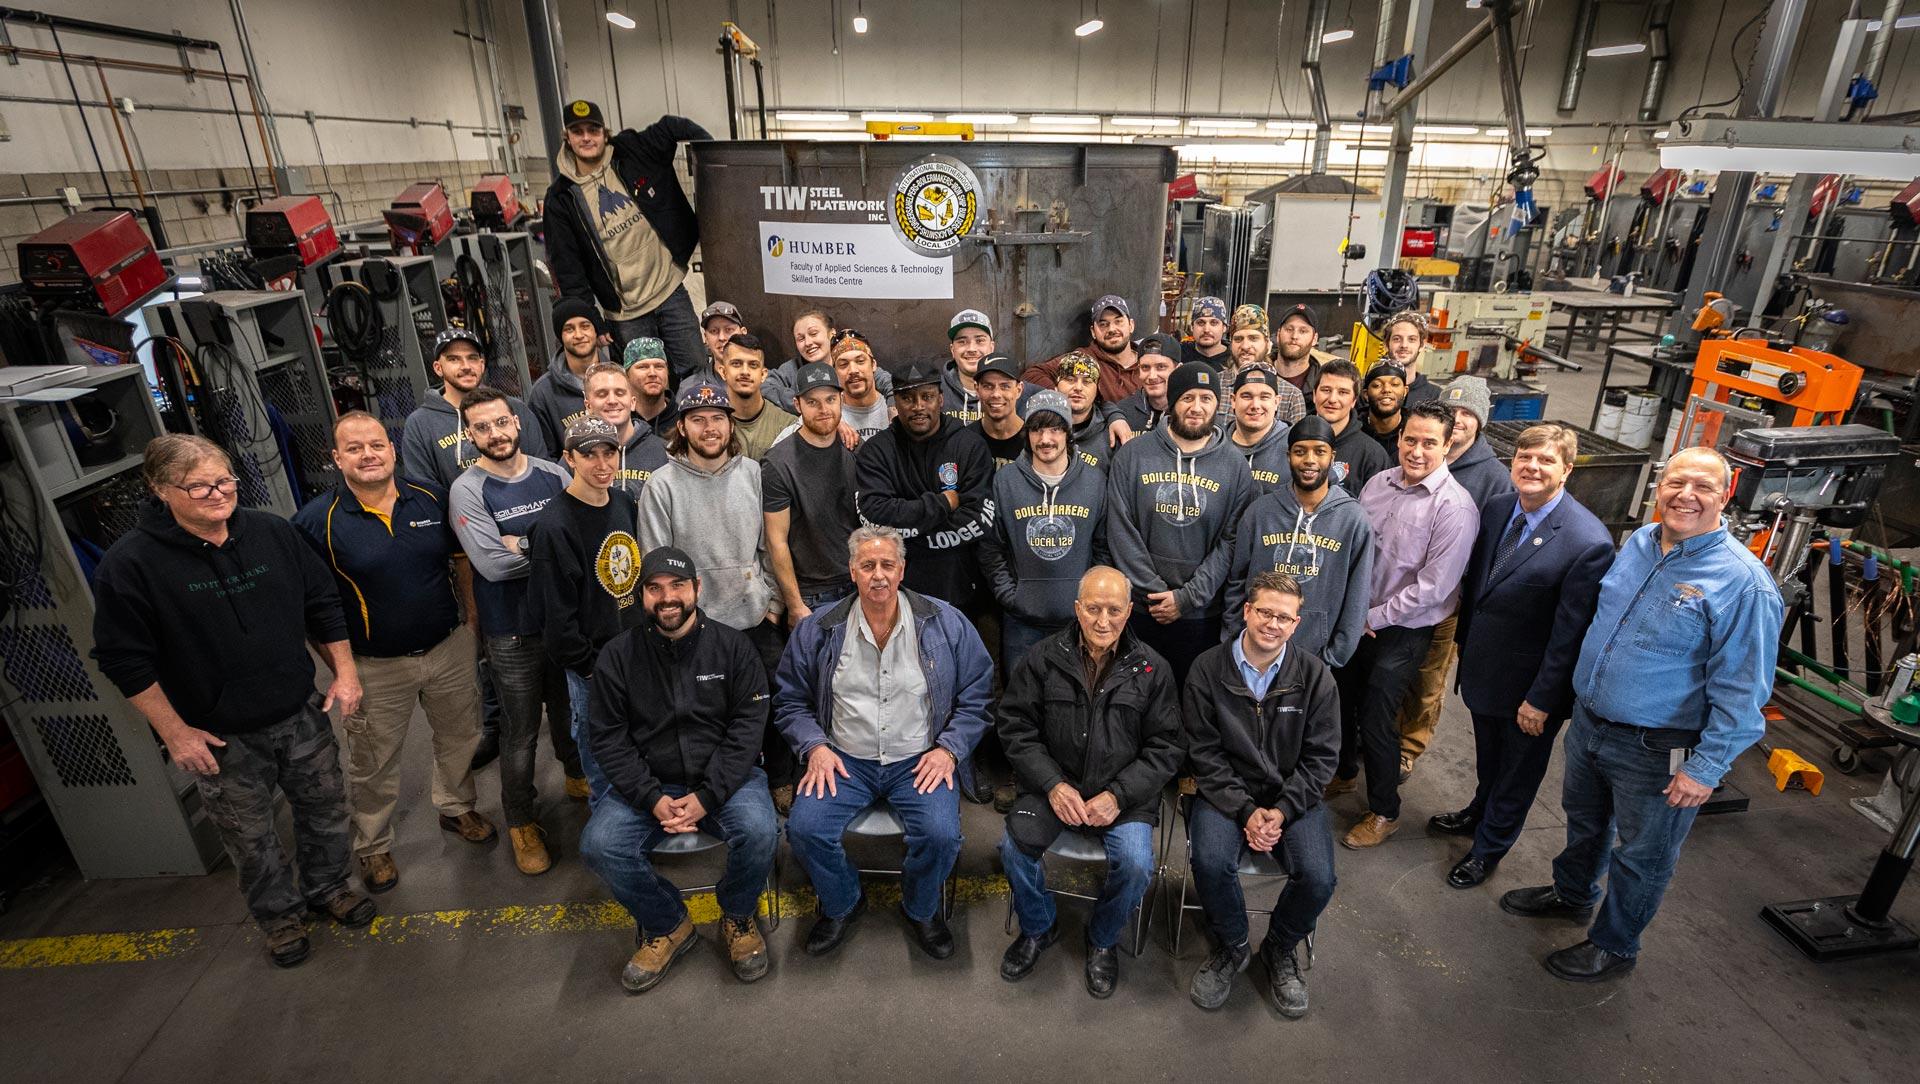 humber-college-tiw-steel-platework-boilermaker-tank-donation-group-shot-1